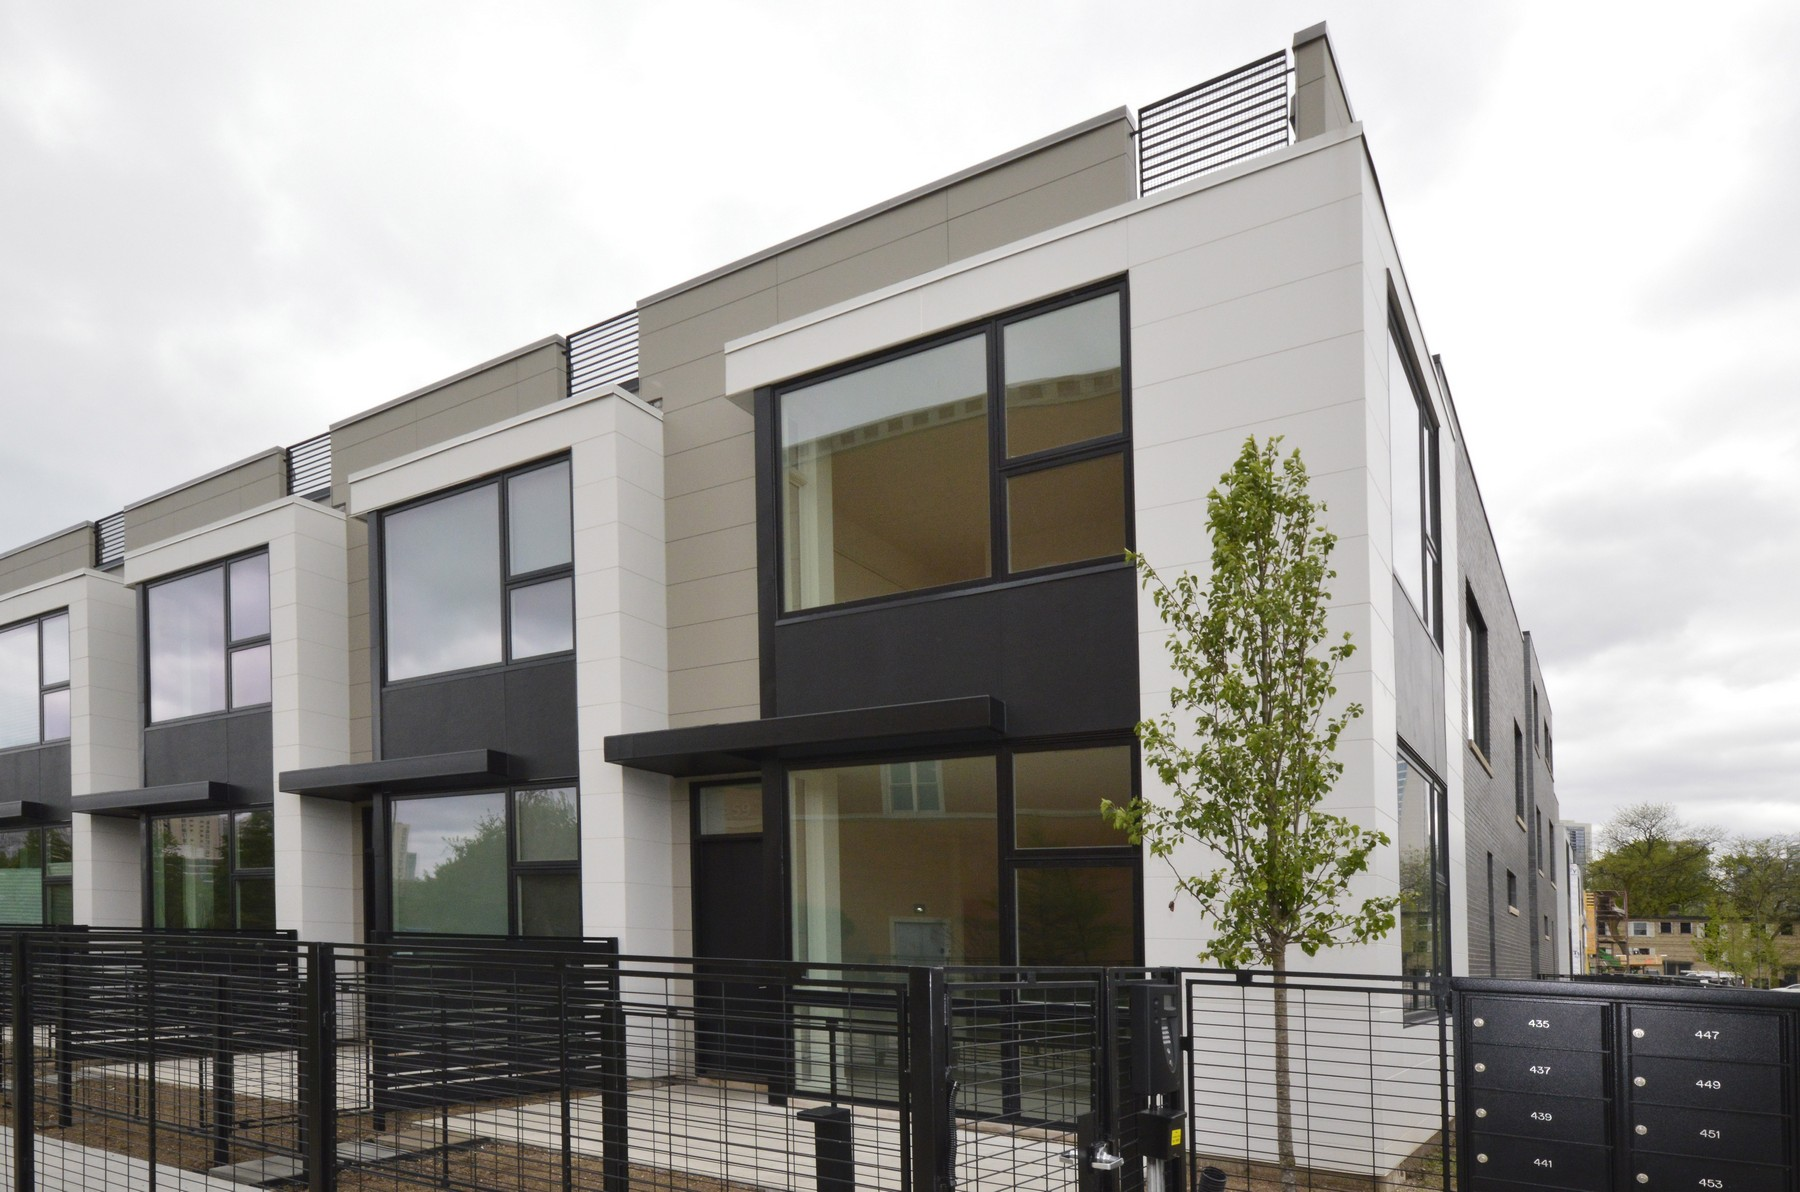 Nhà phố vì Bán tại Live Luxuriously 459 W Hobbie Street Near North Side, Chicago, Illinois, 60610 Hoa Kỳ